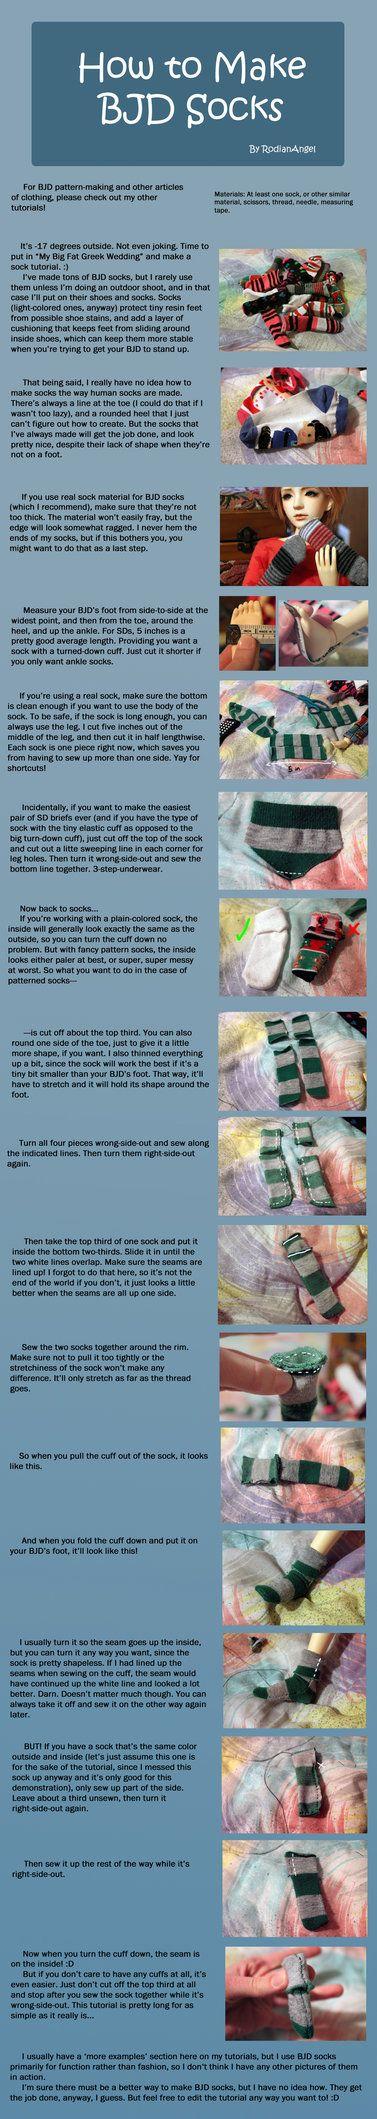 how to make bjd clothes